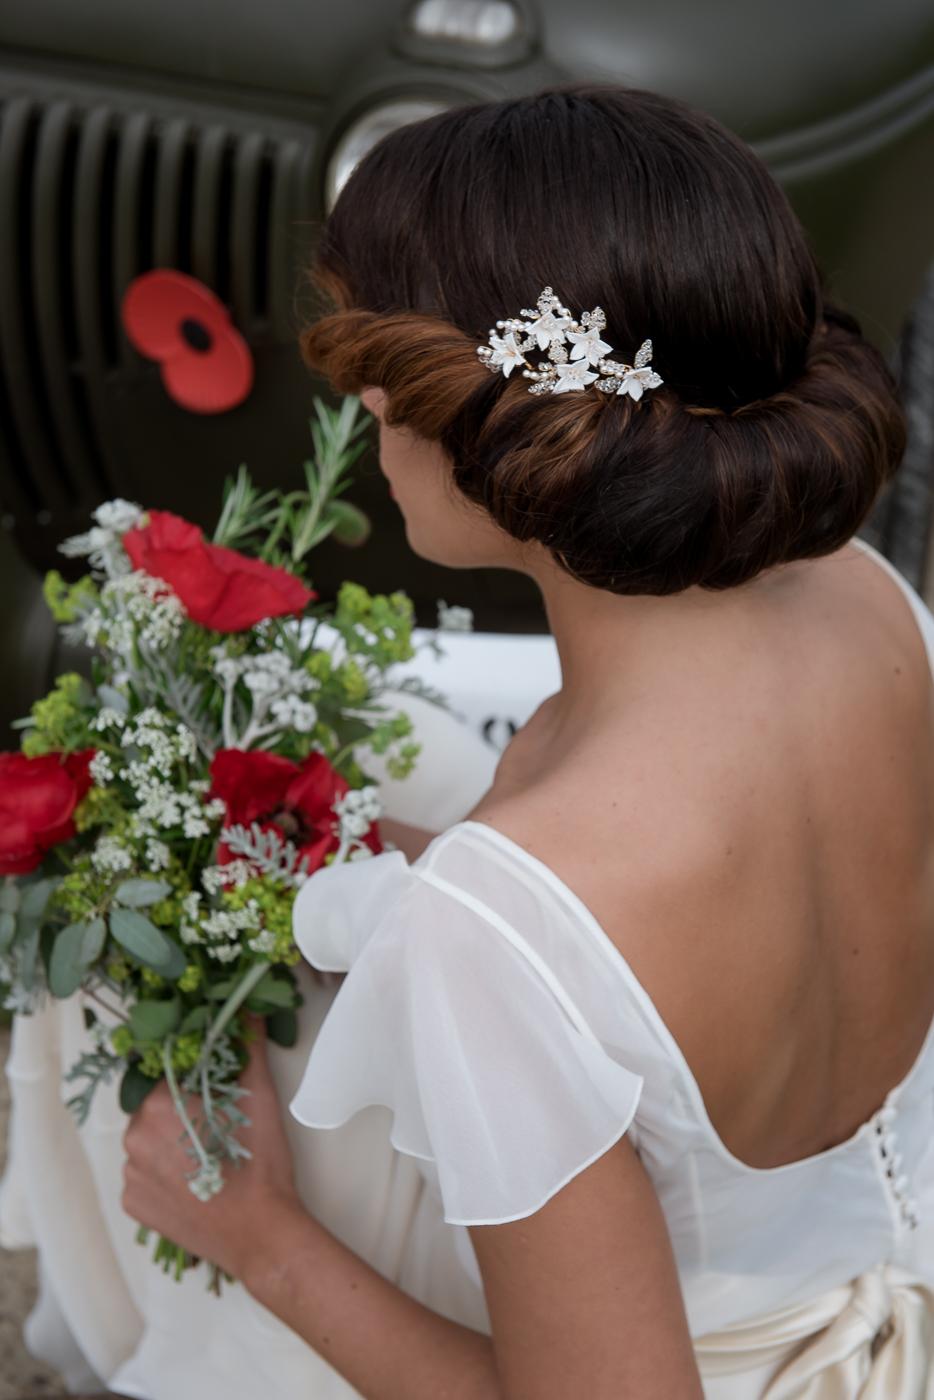 vintage wedding glam hairstyles victory rolls